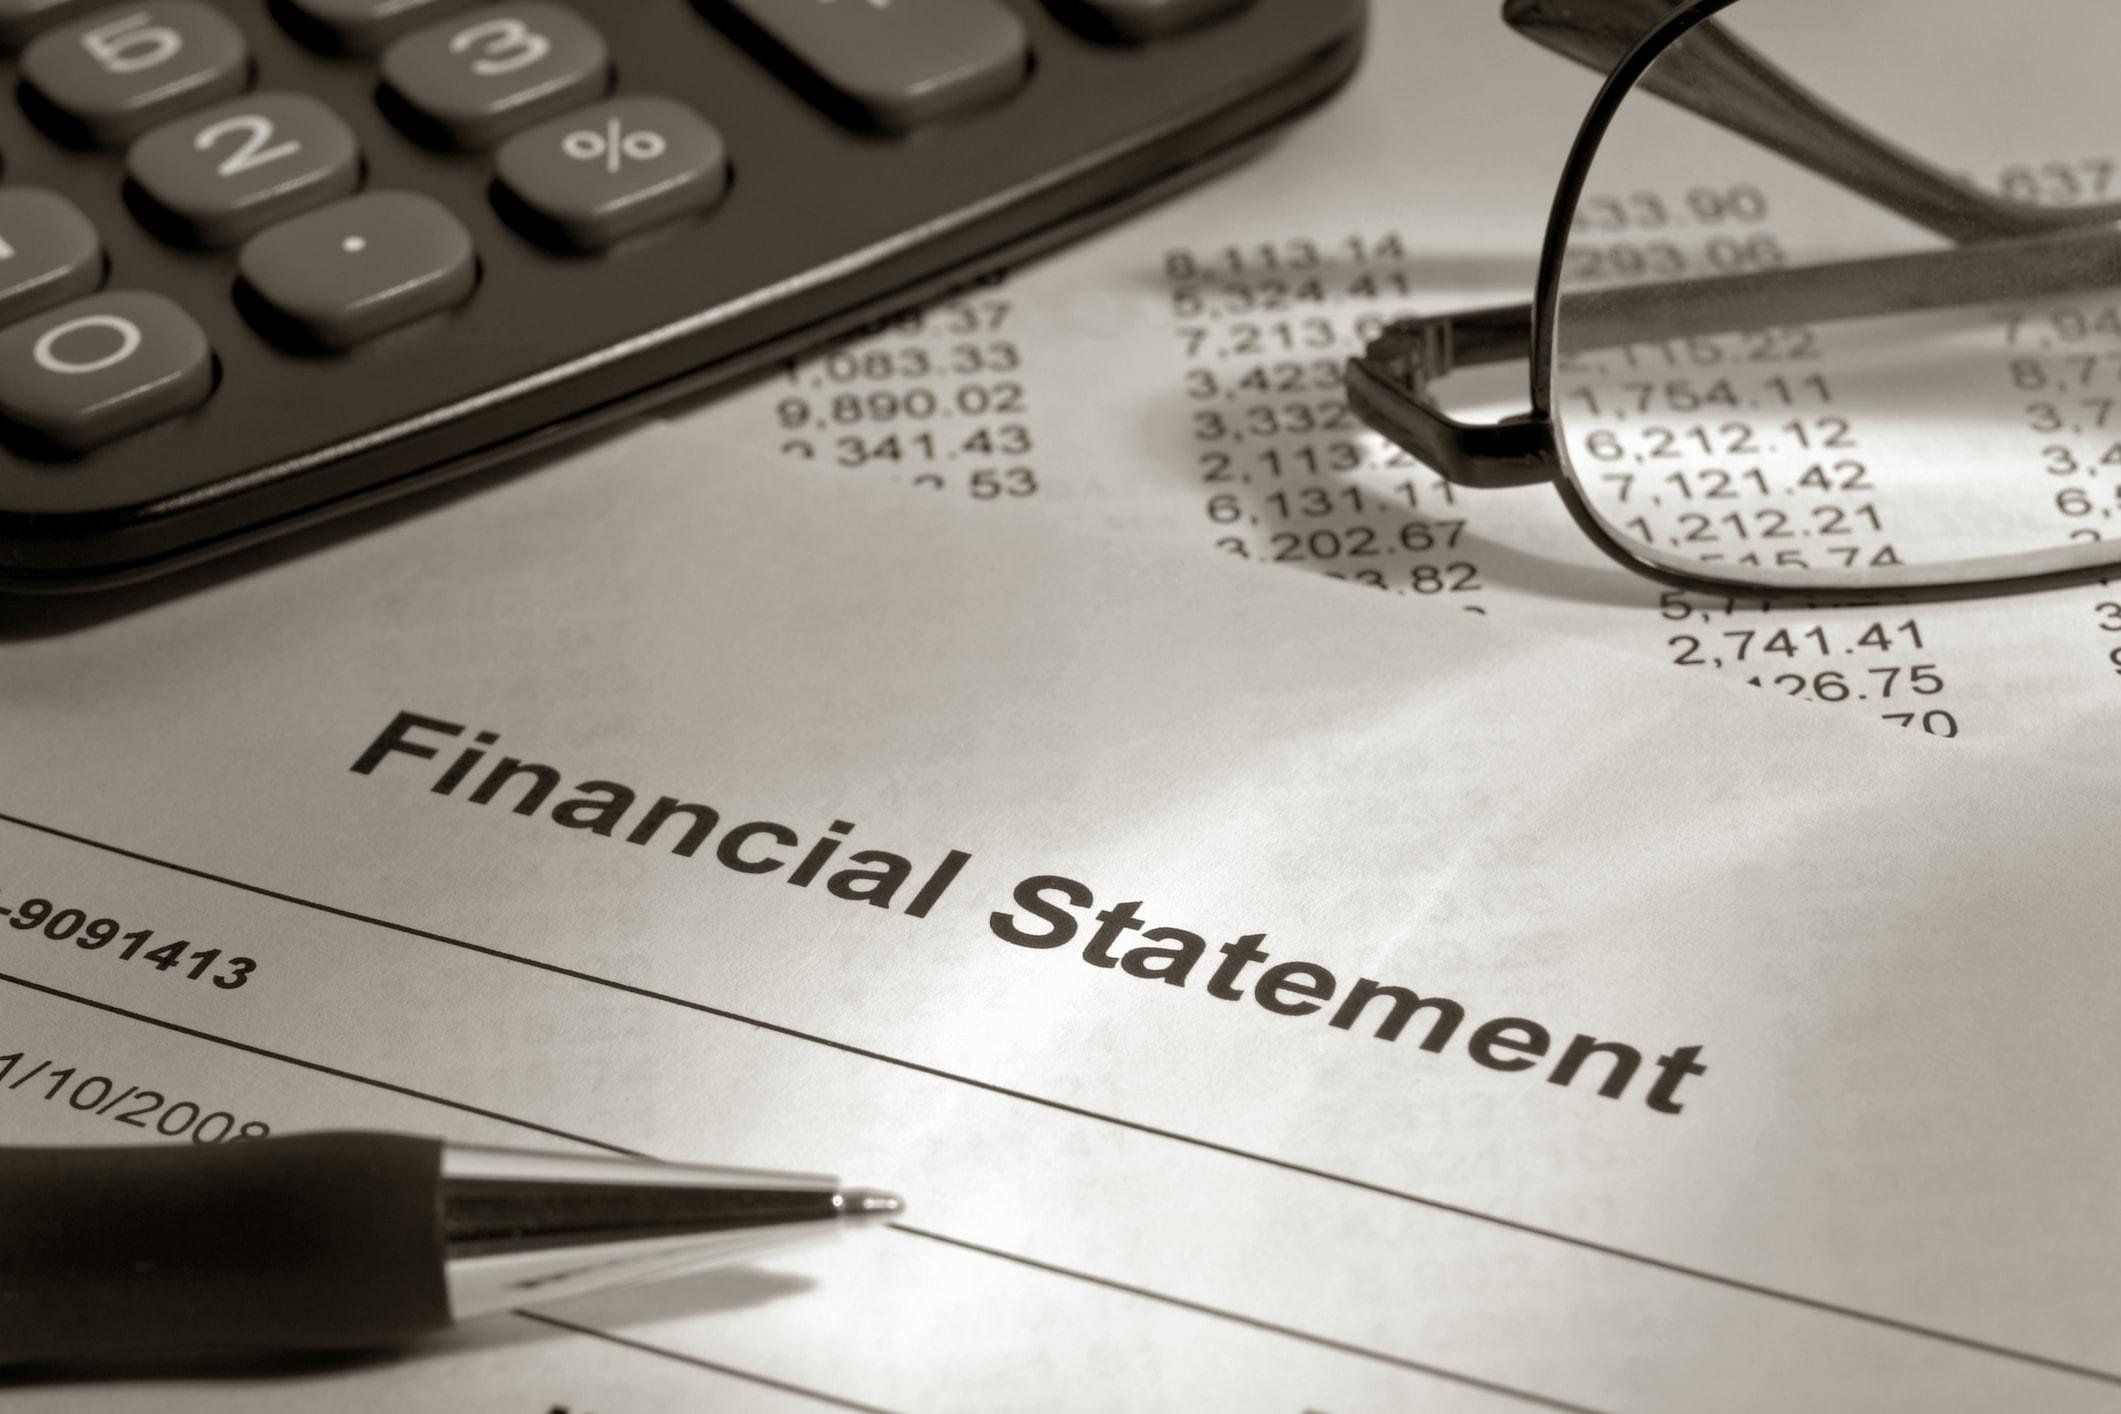 Scott Poore Wunderlich Securities Dreamstime Statement Min